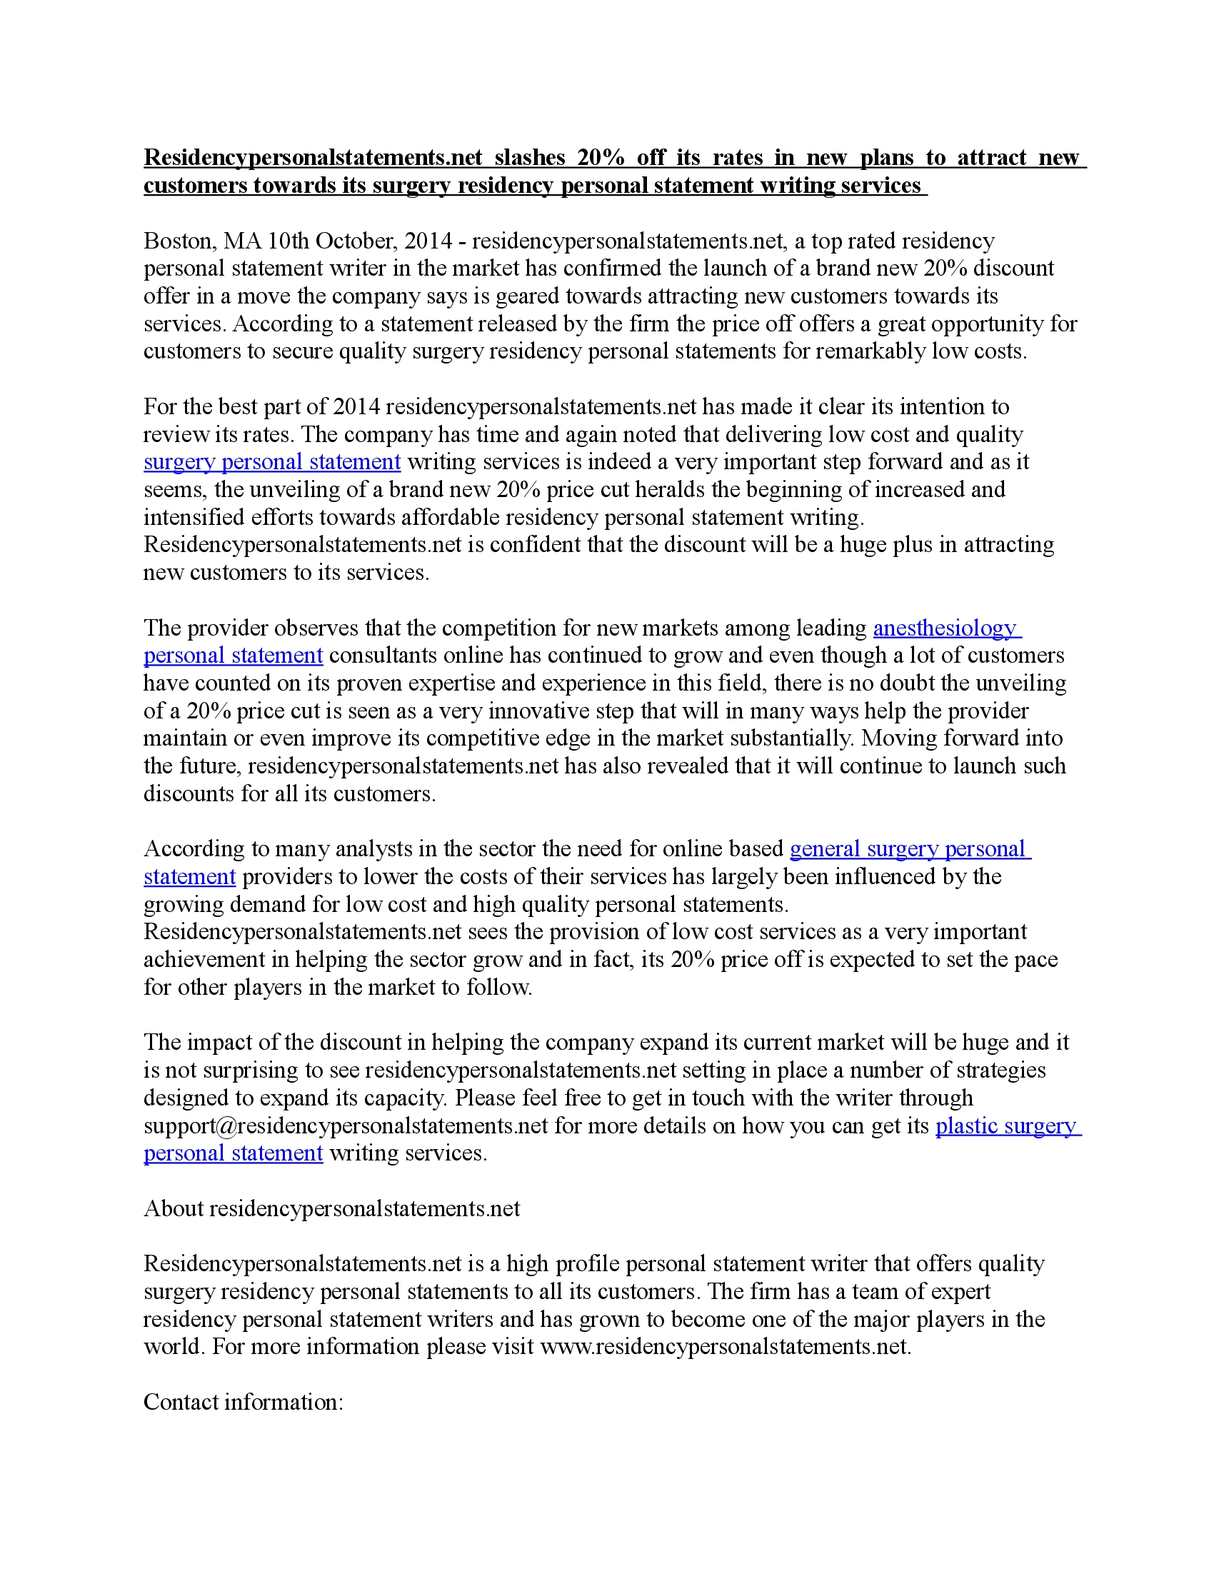 Calaméo - Residencypersonalstatements net slashes 20% off